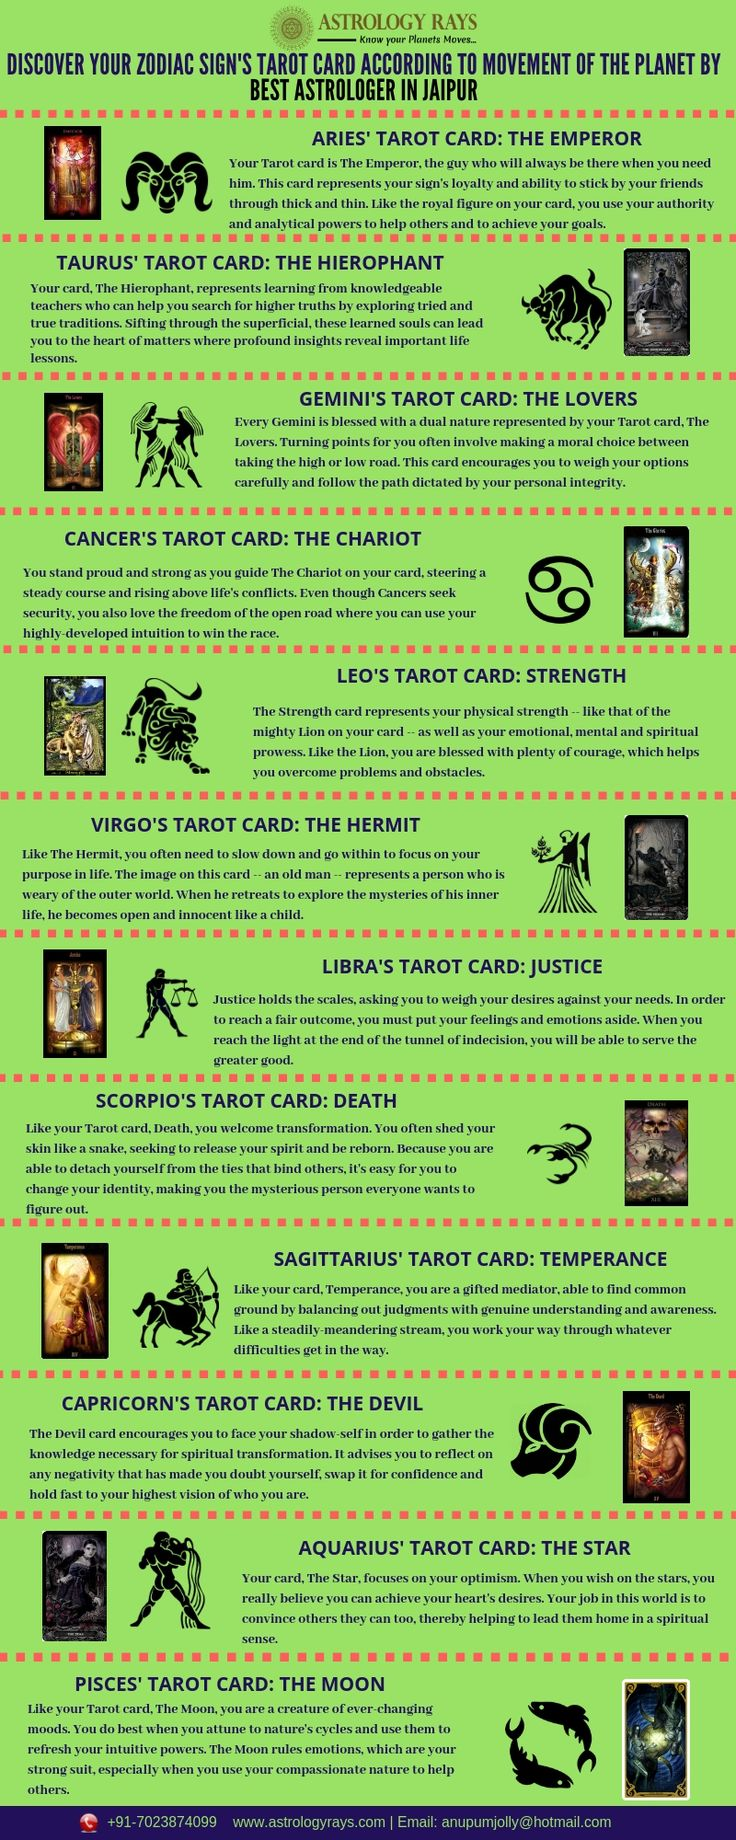 Discover your zodiac signs tarot card cancer tarot leo